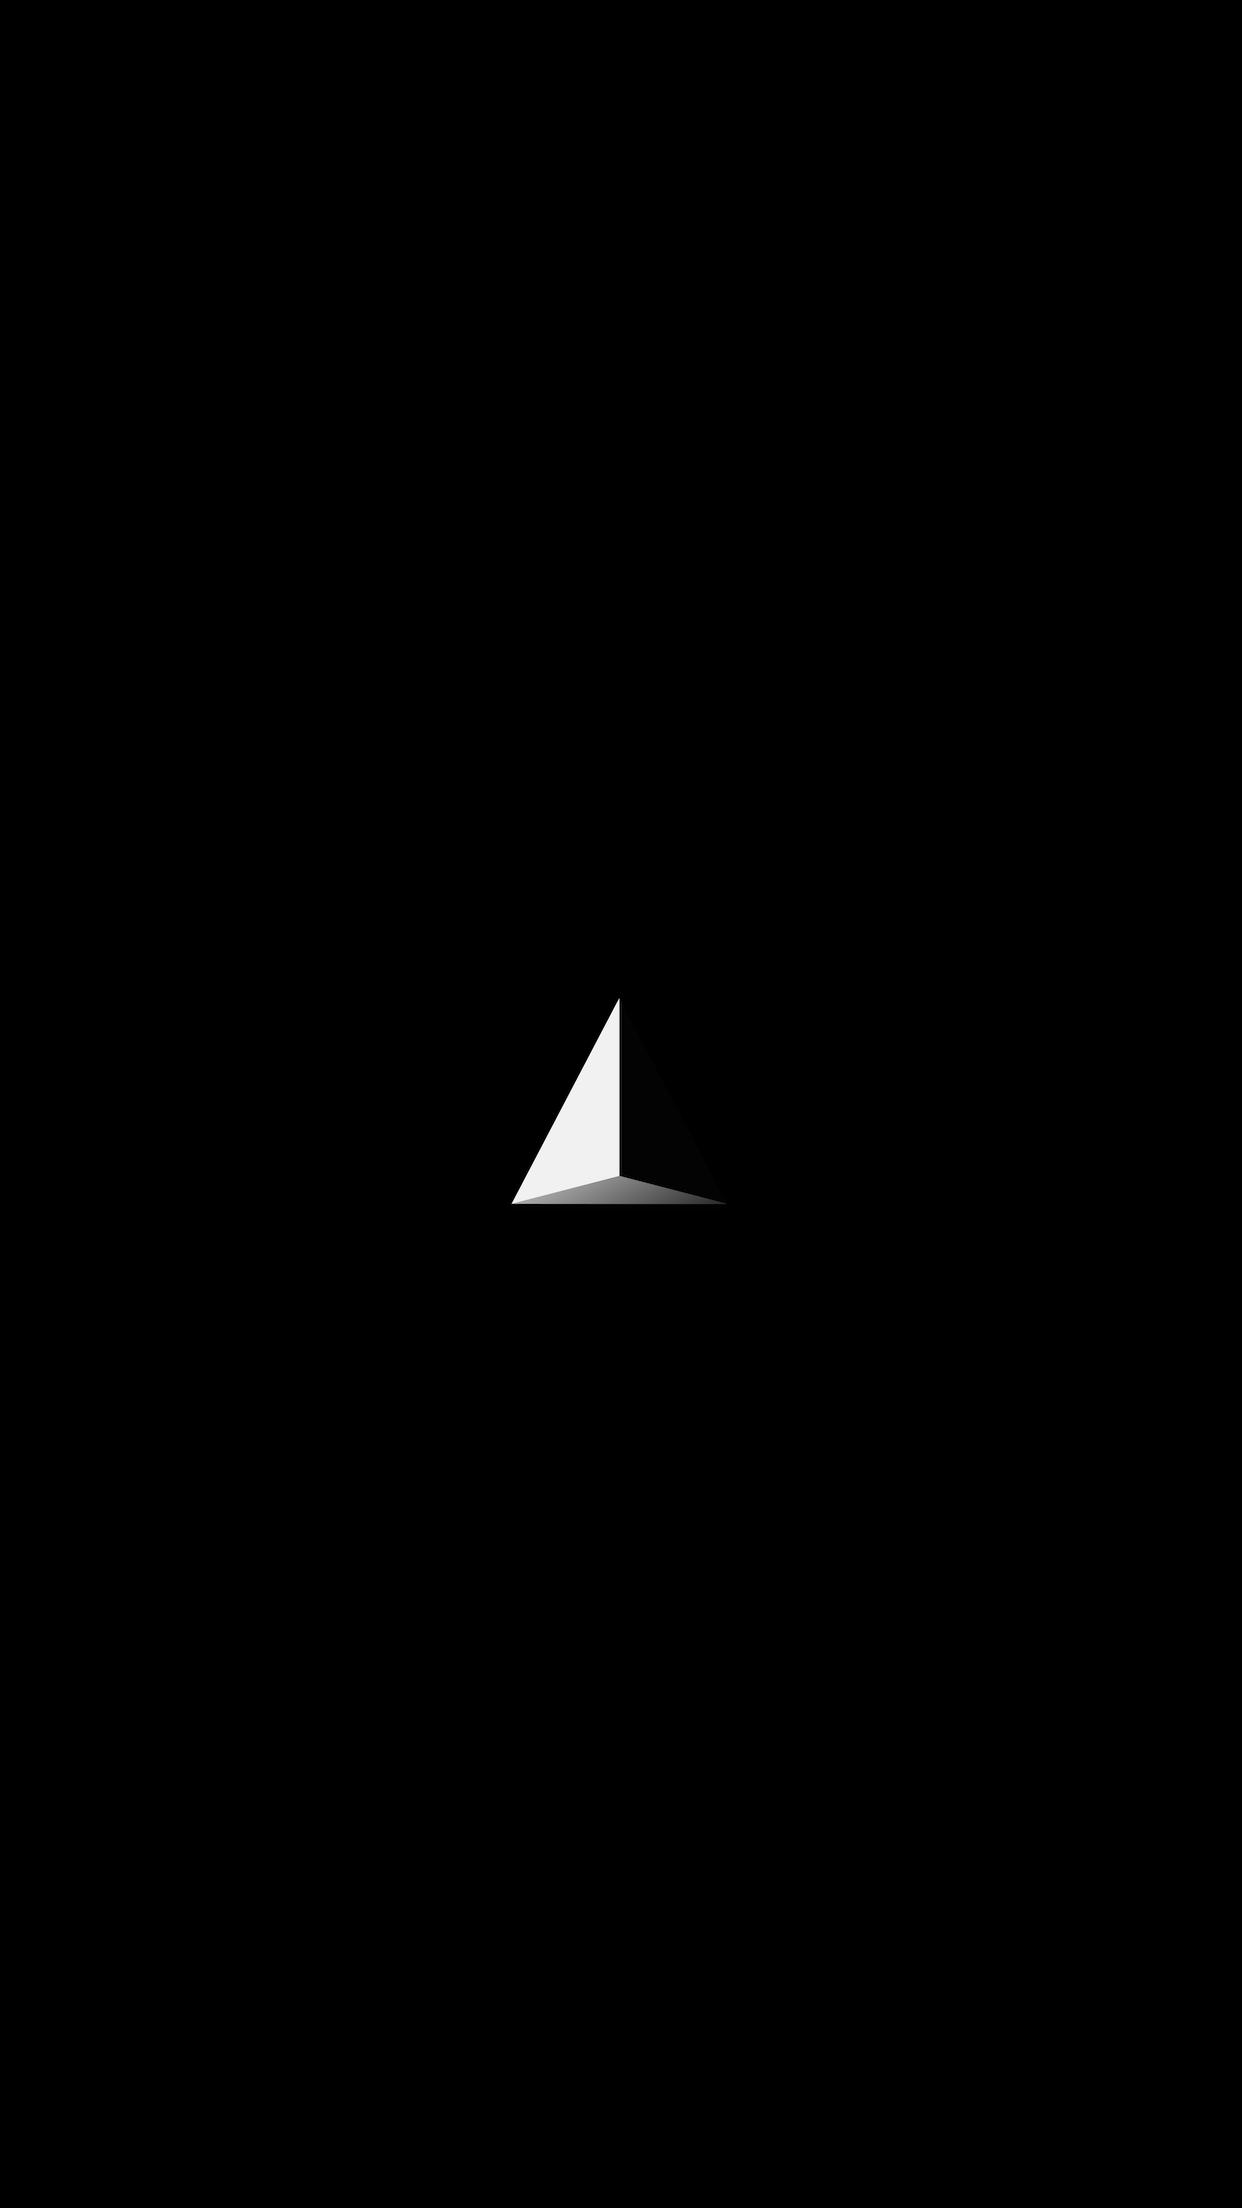 contrib/mobile/iOS/Onelab/Images.xcassets/LaunchImage.launchimage/splash1242x2208.png